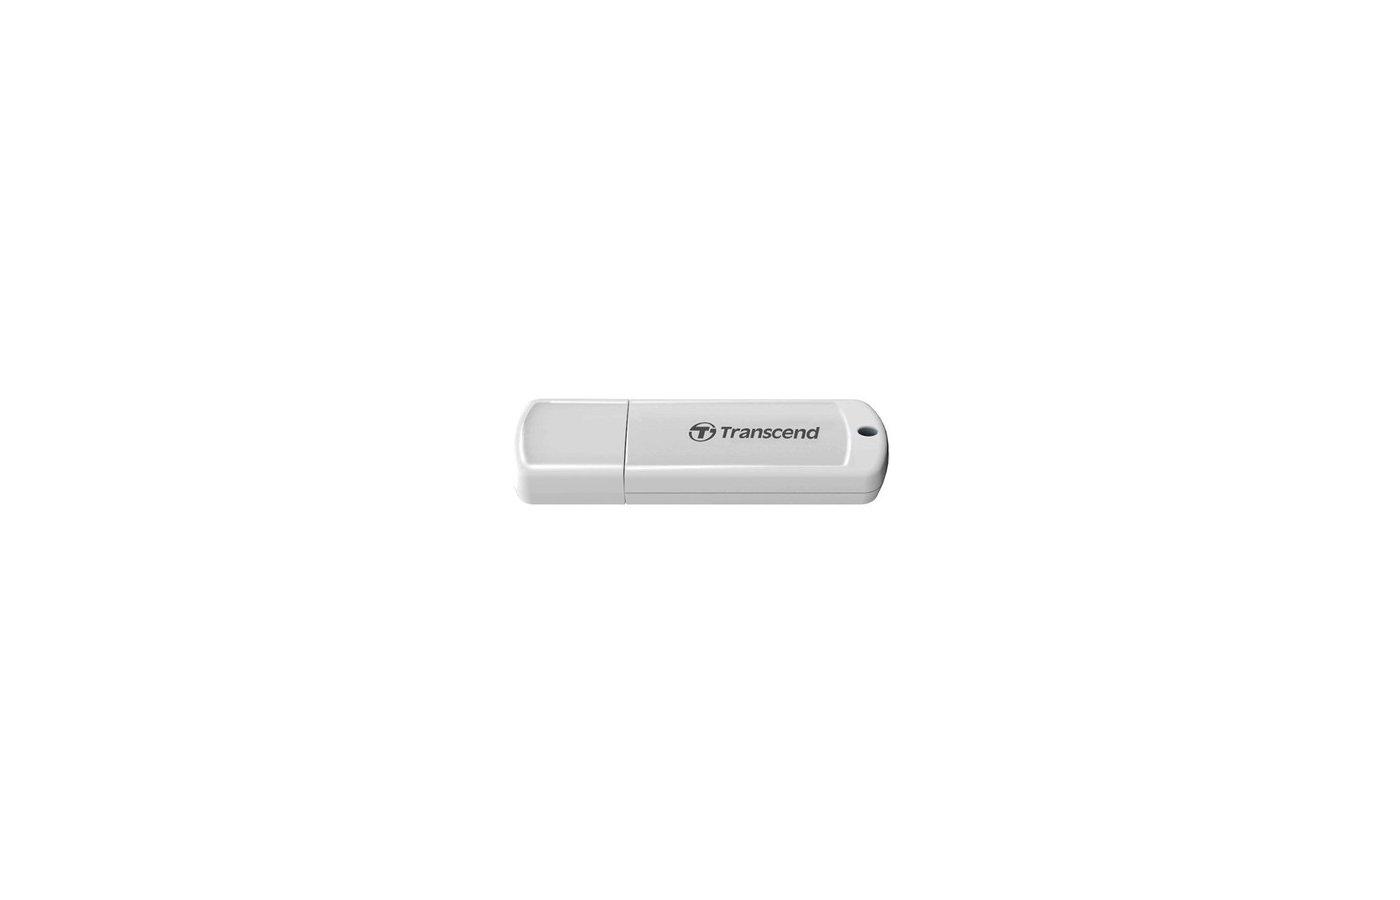 Флеш-диск Transcend 16Gb JetFlash 370 TS16GJF370 USB2.0 белый